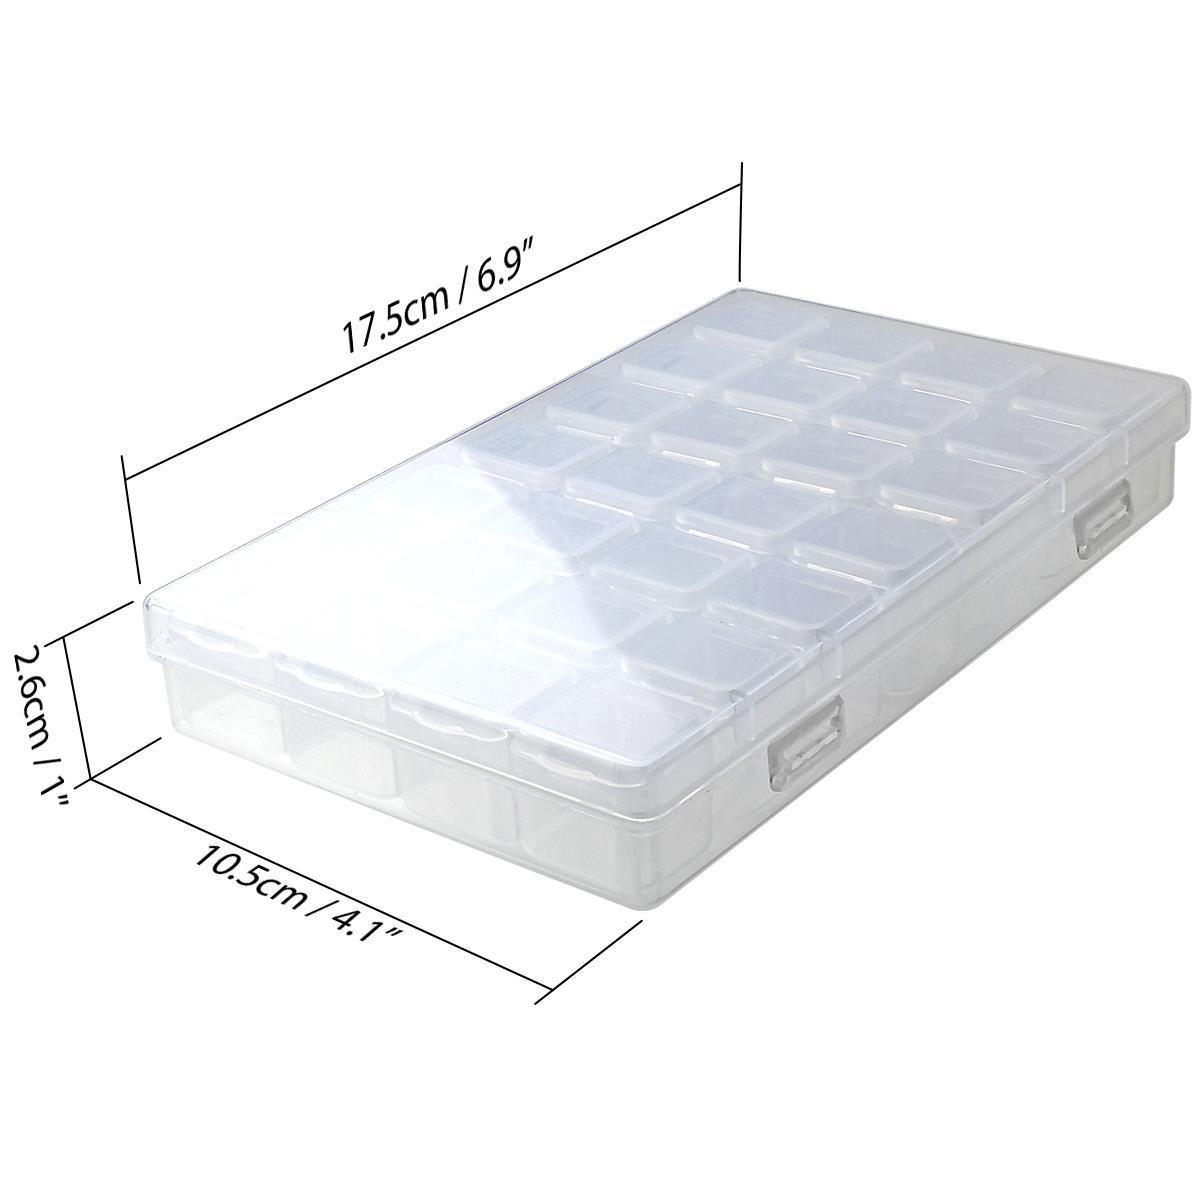 28-Diamond-Painting-Storage-Boxes-Bead-Organiser-Tray-Art-Beads-Embroidery-Case thumbnail 6